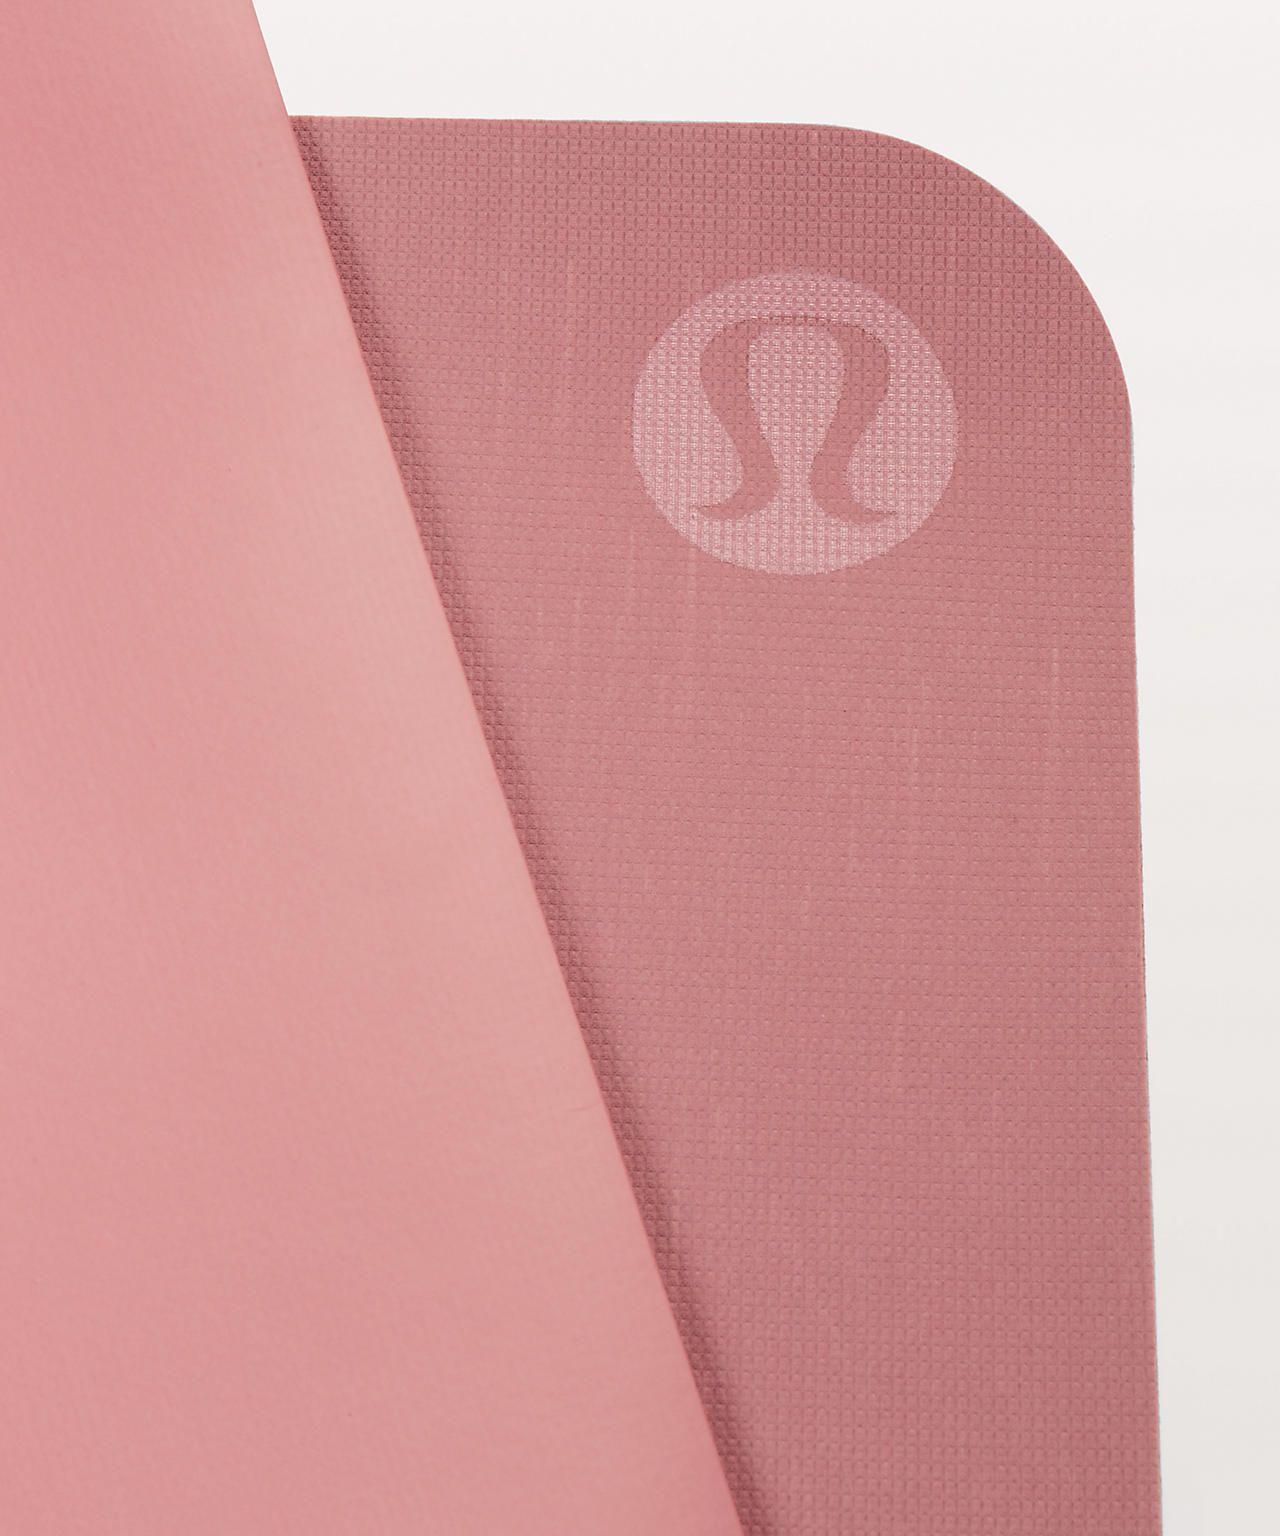 The Reversible Mat 5mm Women S Yoga Mats Yoga For Stress Relief Yoga Women Yoga Mat